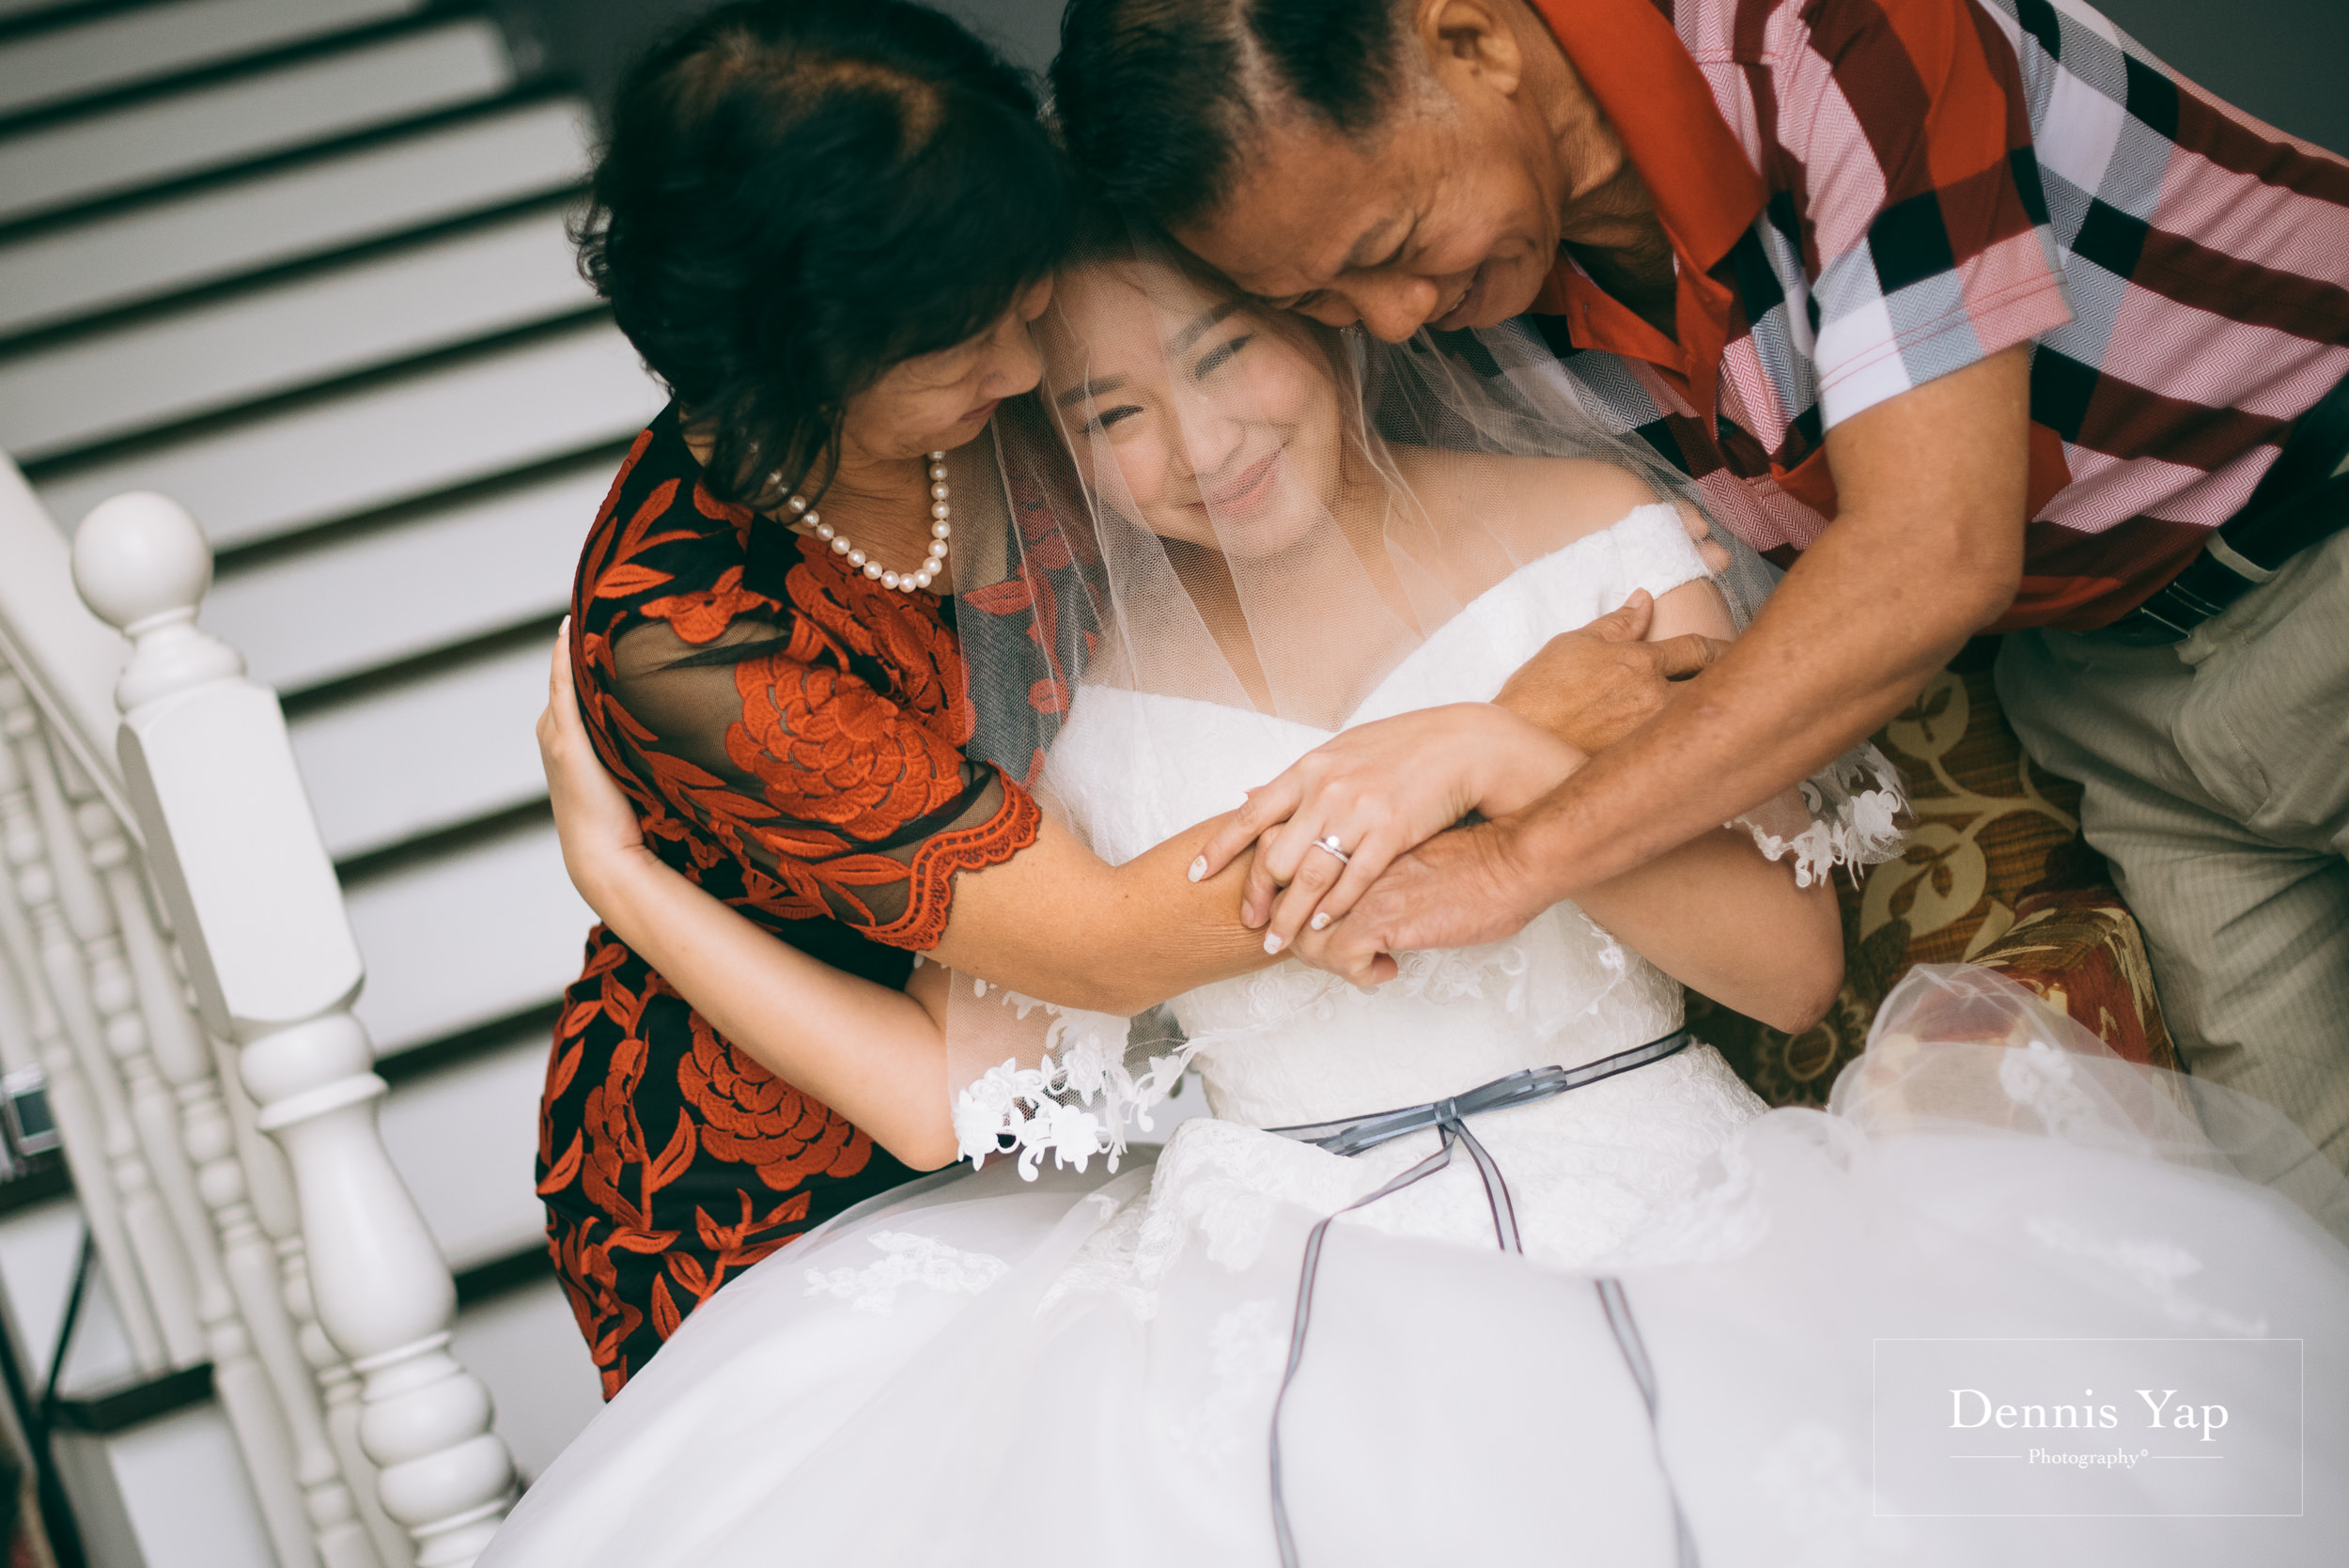 joon keat siew hui wedding day dennis yap malaysia wedding photographer-8.jpg